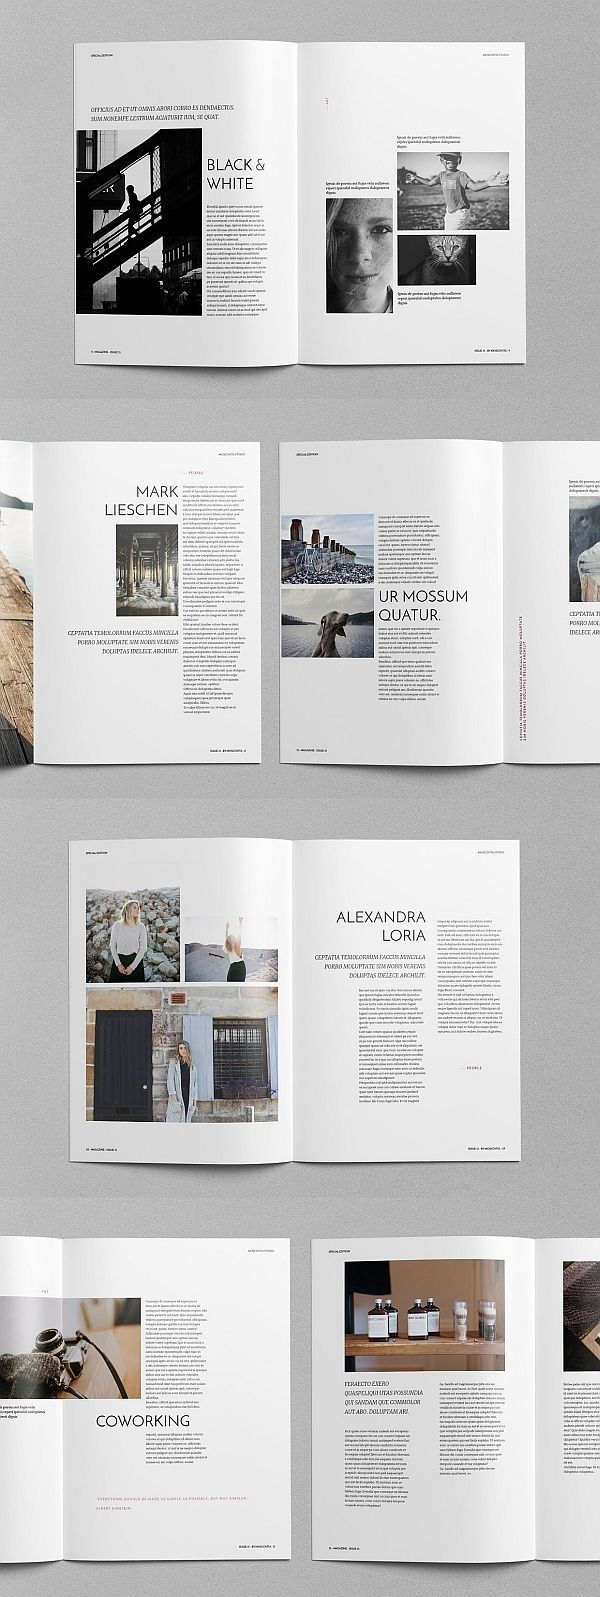 Eko Magazine Template Magazine Brochure Template Brochuretemplate Brochuredesign La Magazine Layout Inspiration Page Layout Design Magazine Layout Design